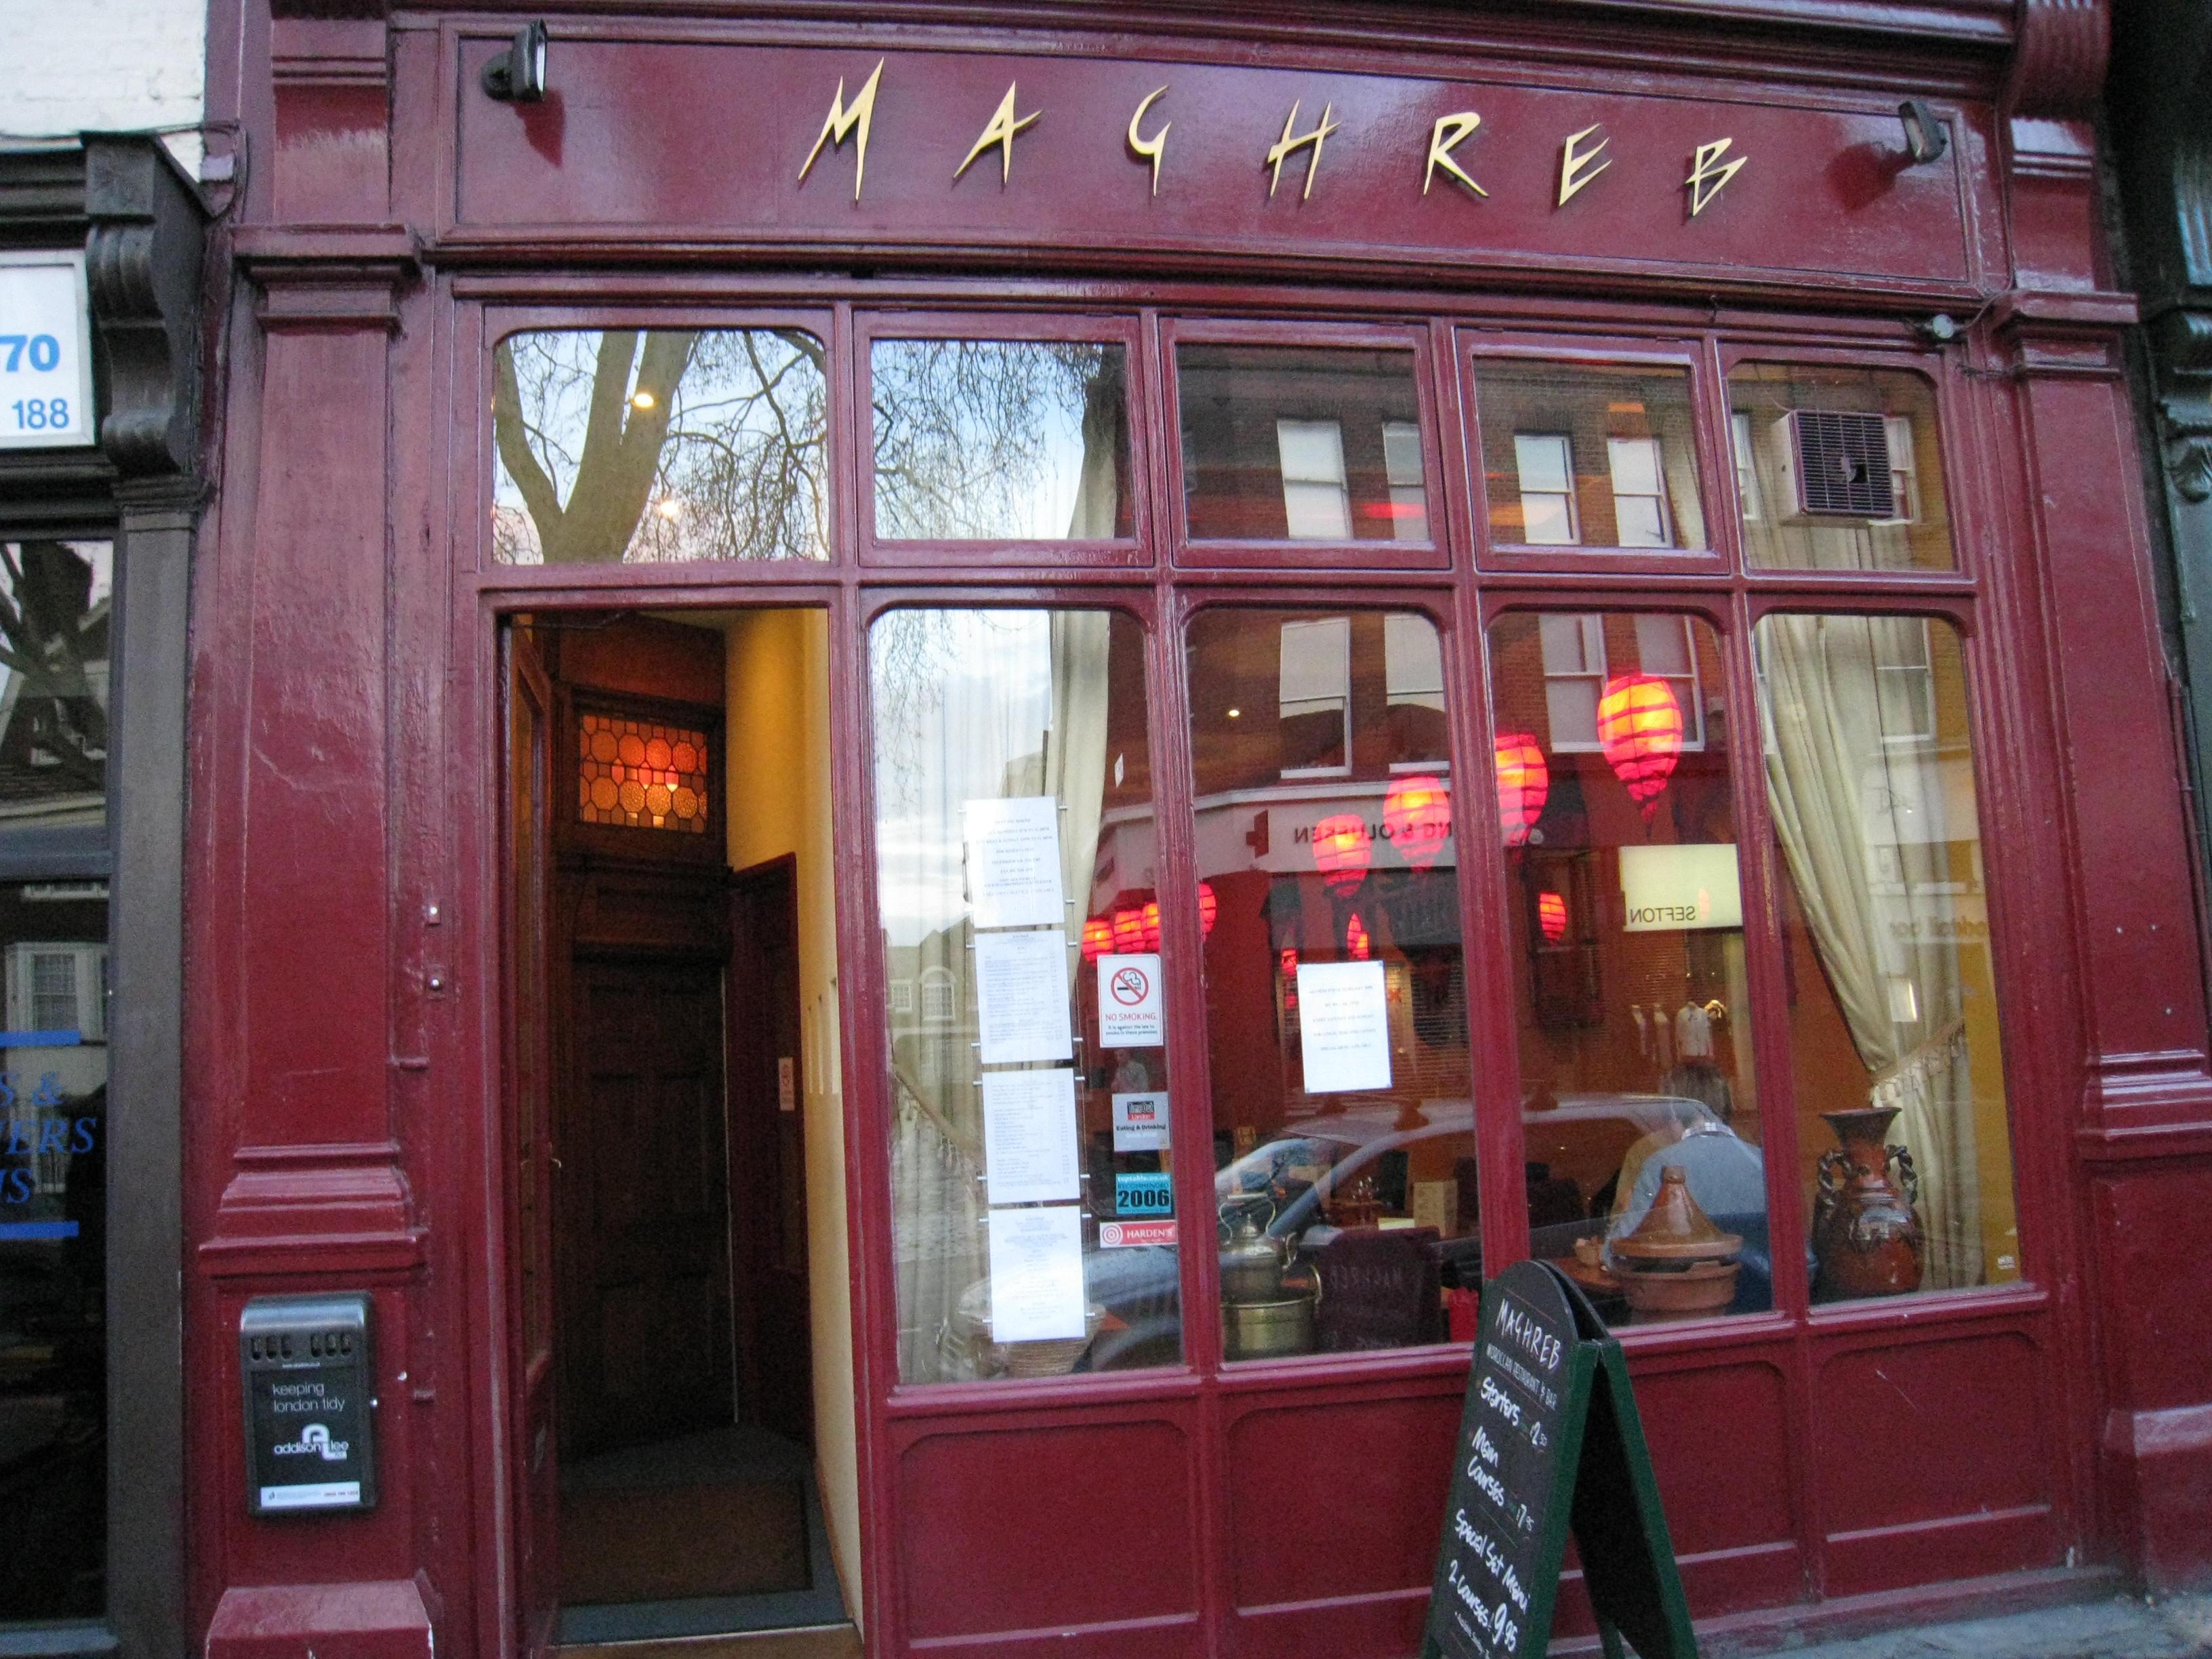 Maghreb London